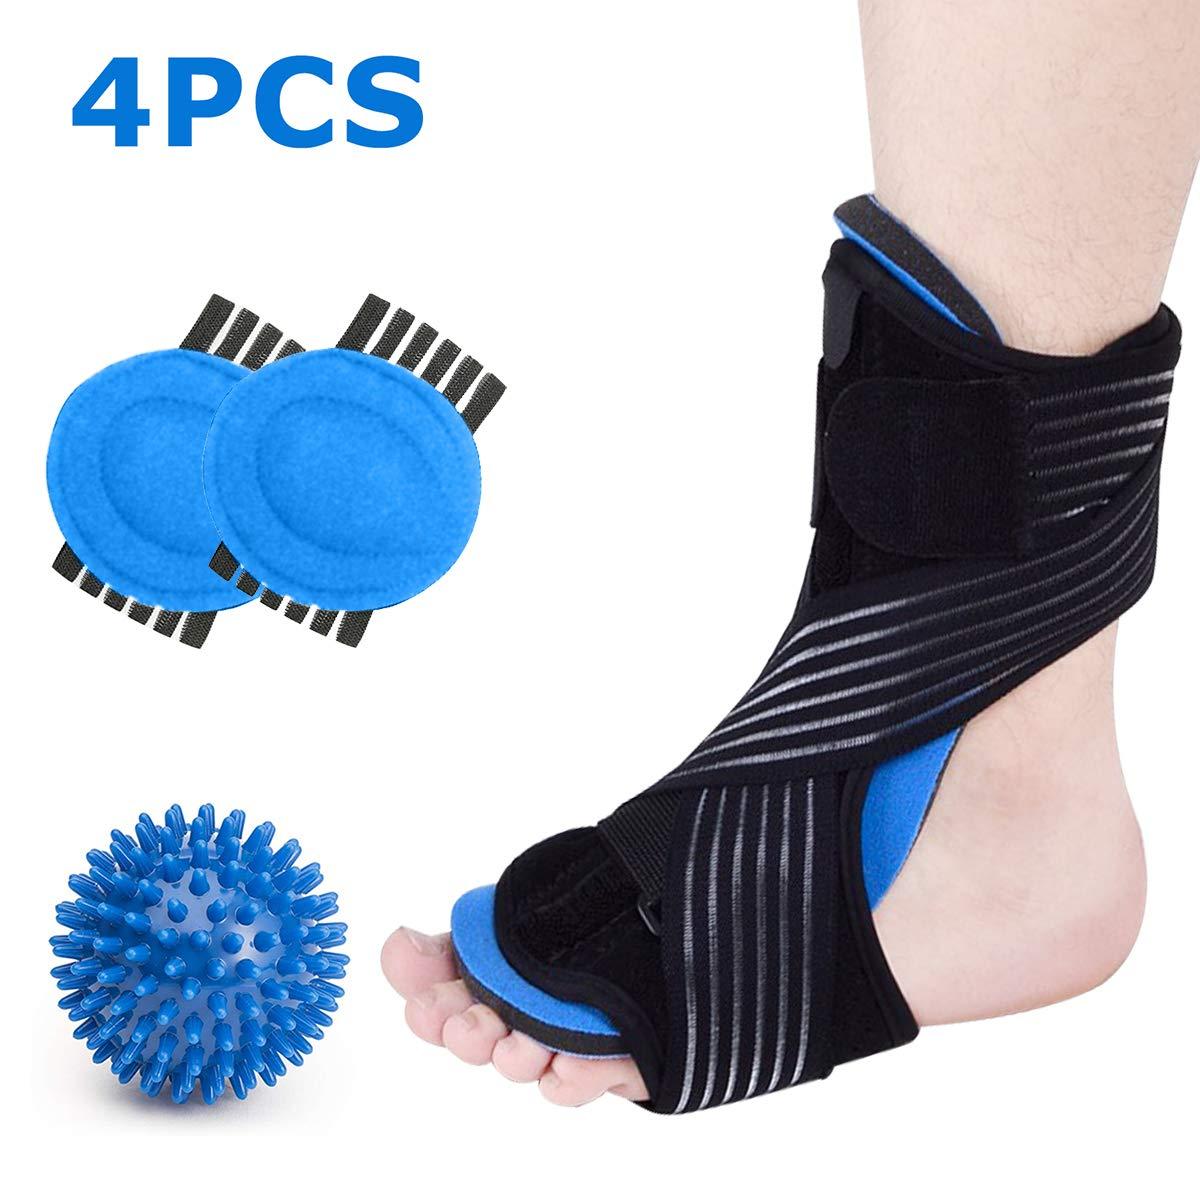 Plantar Fasciitis Night Splint Foot Brace Support Kit for Sleep, Adjustable Dorsal Plantar Fasciitis Splint + Arch Supports + Spiky Massage Ball for Arch, Heel, Foot Drop Pain by HozHoy